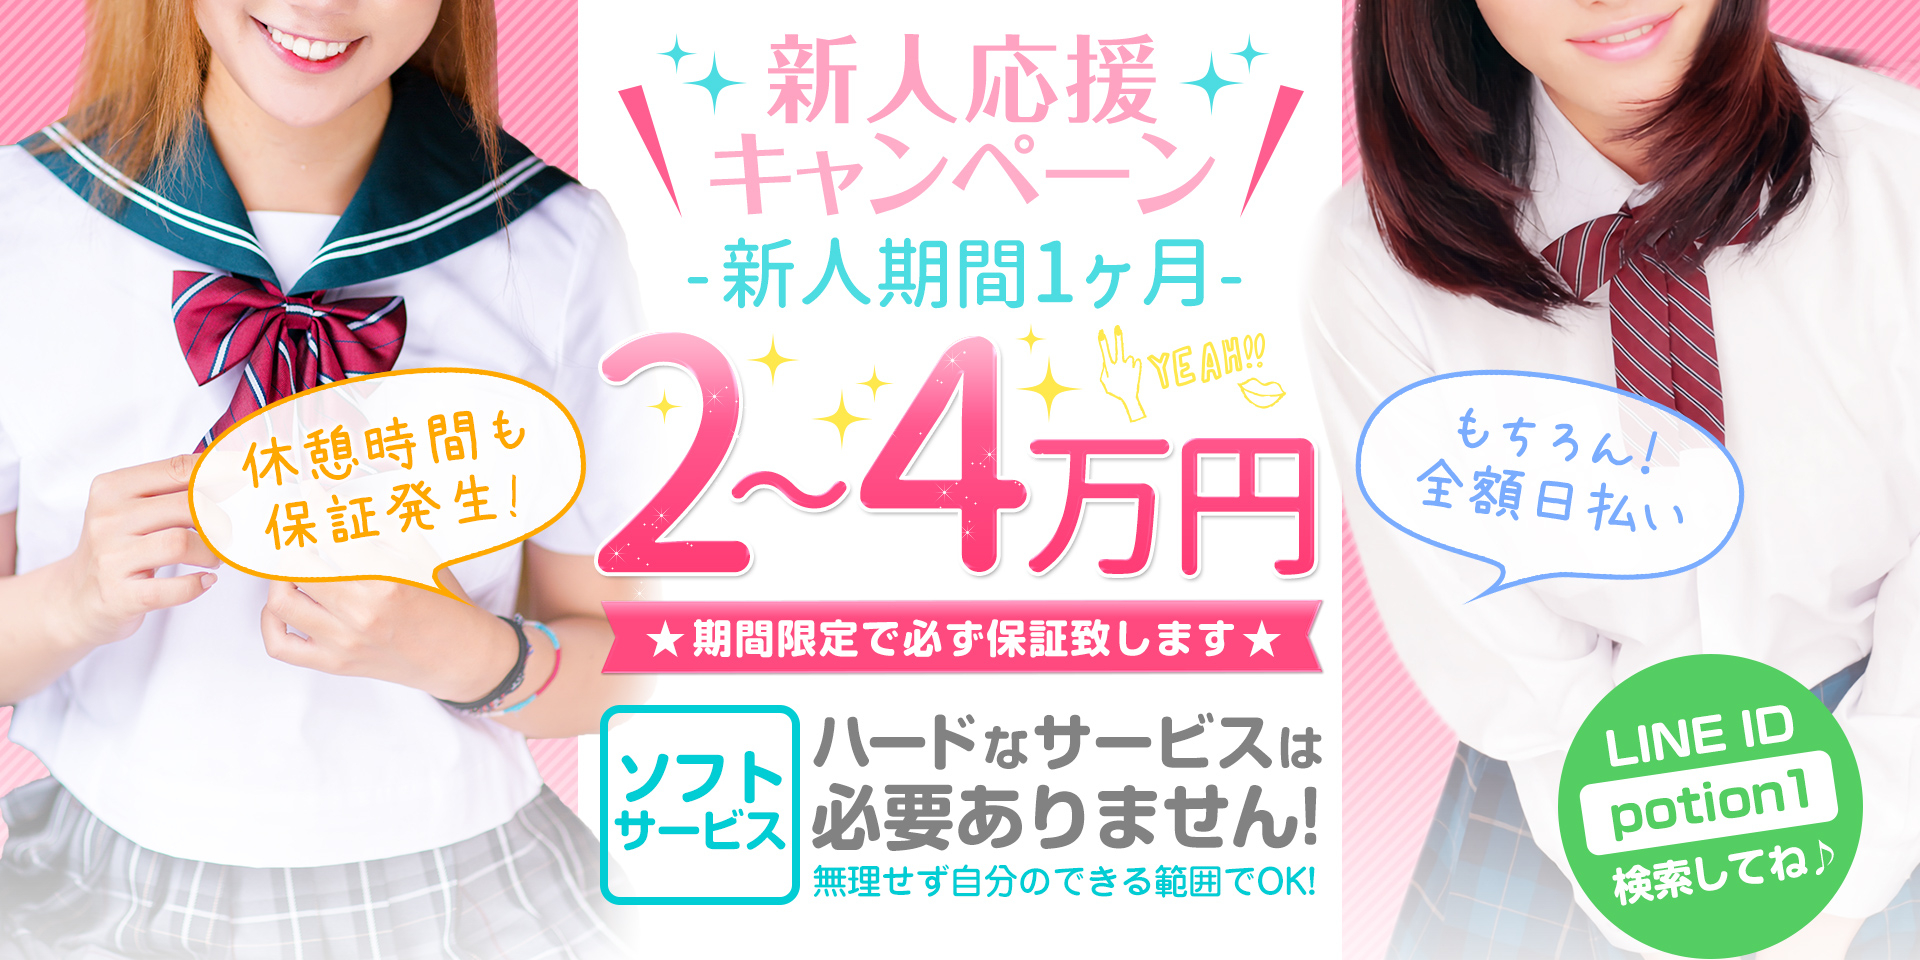 LOVE POTION~ラブポーション~(平塚ピンサロ店)の風俗求人・高収入バイト求人PR画像3